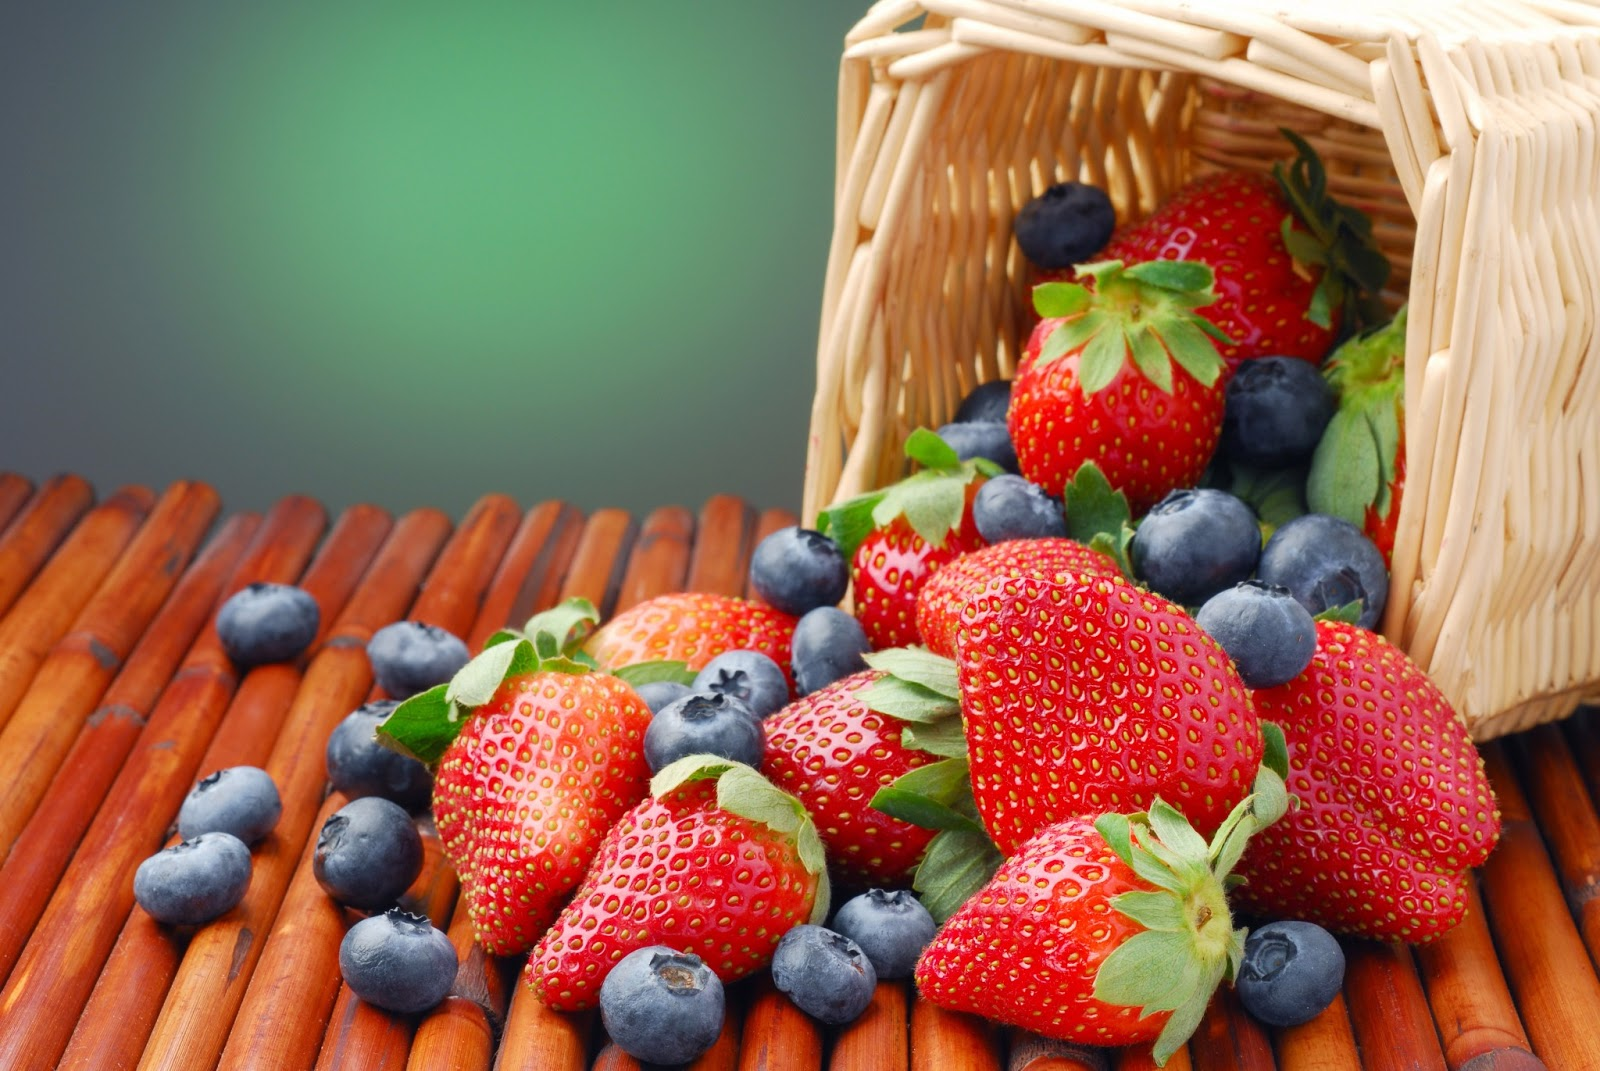 - La fruta fresca -